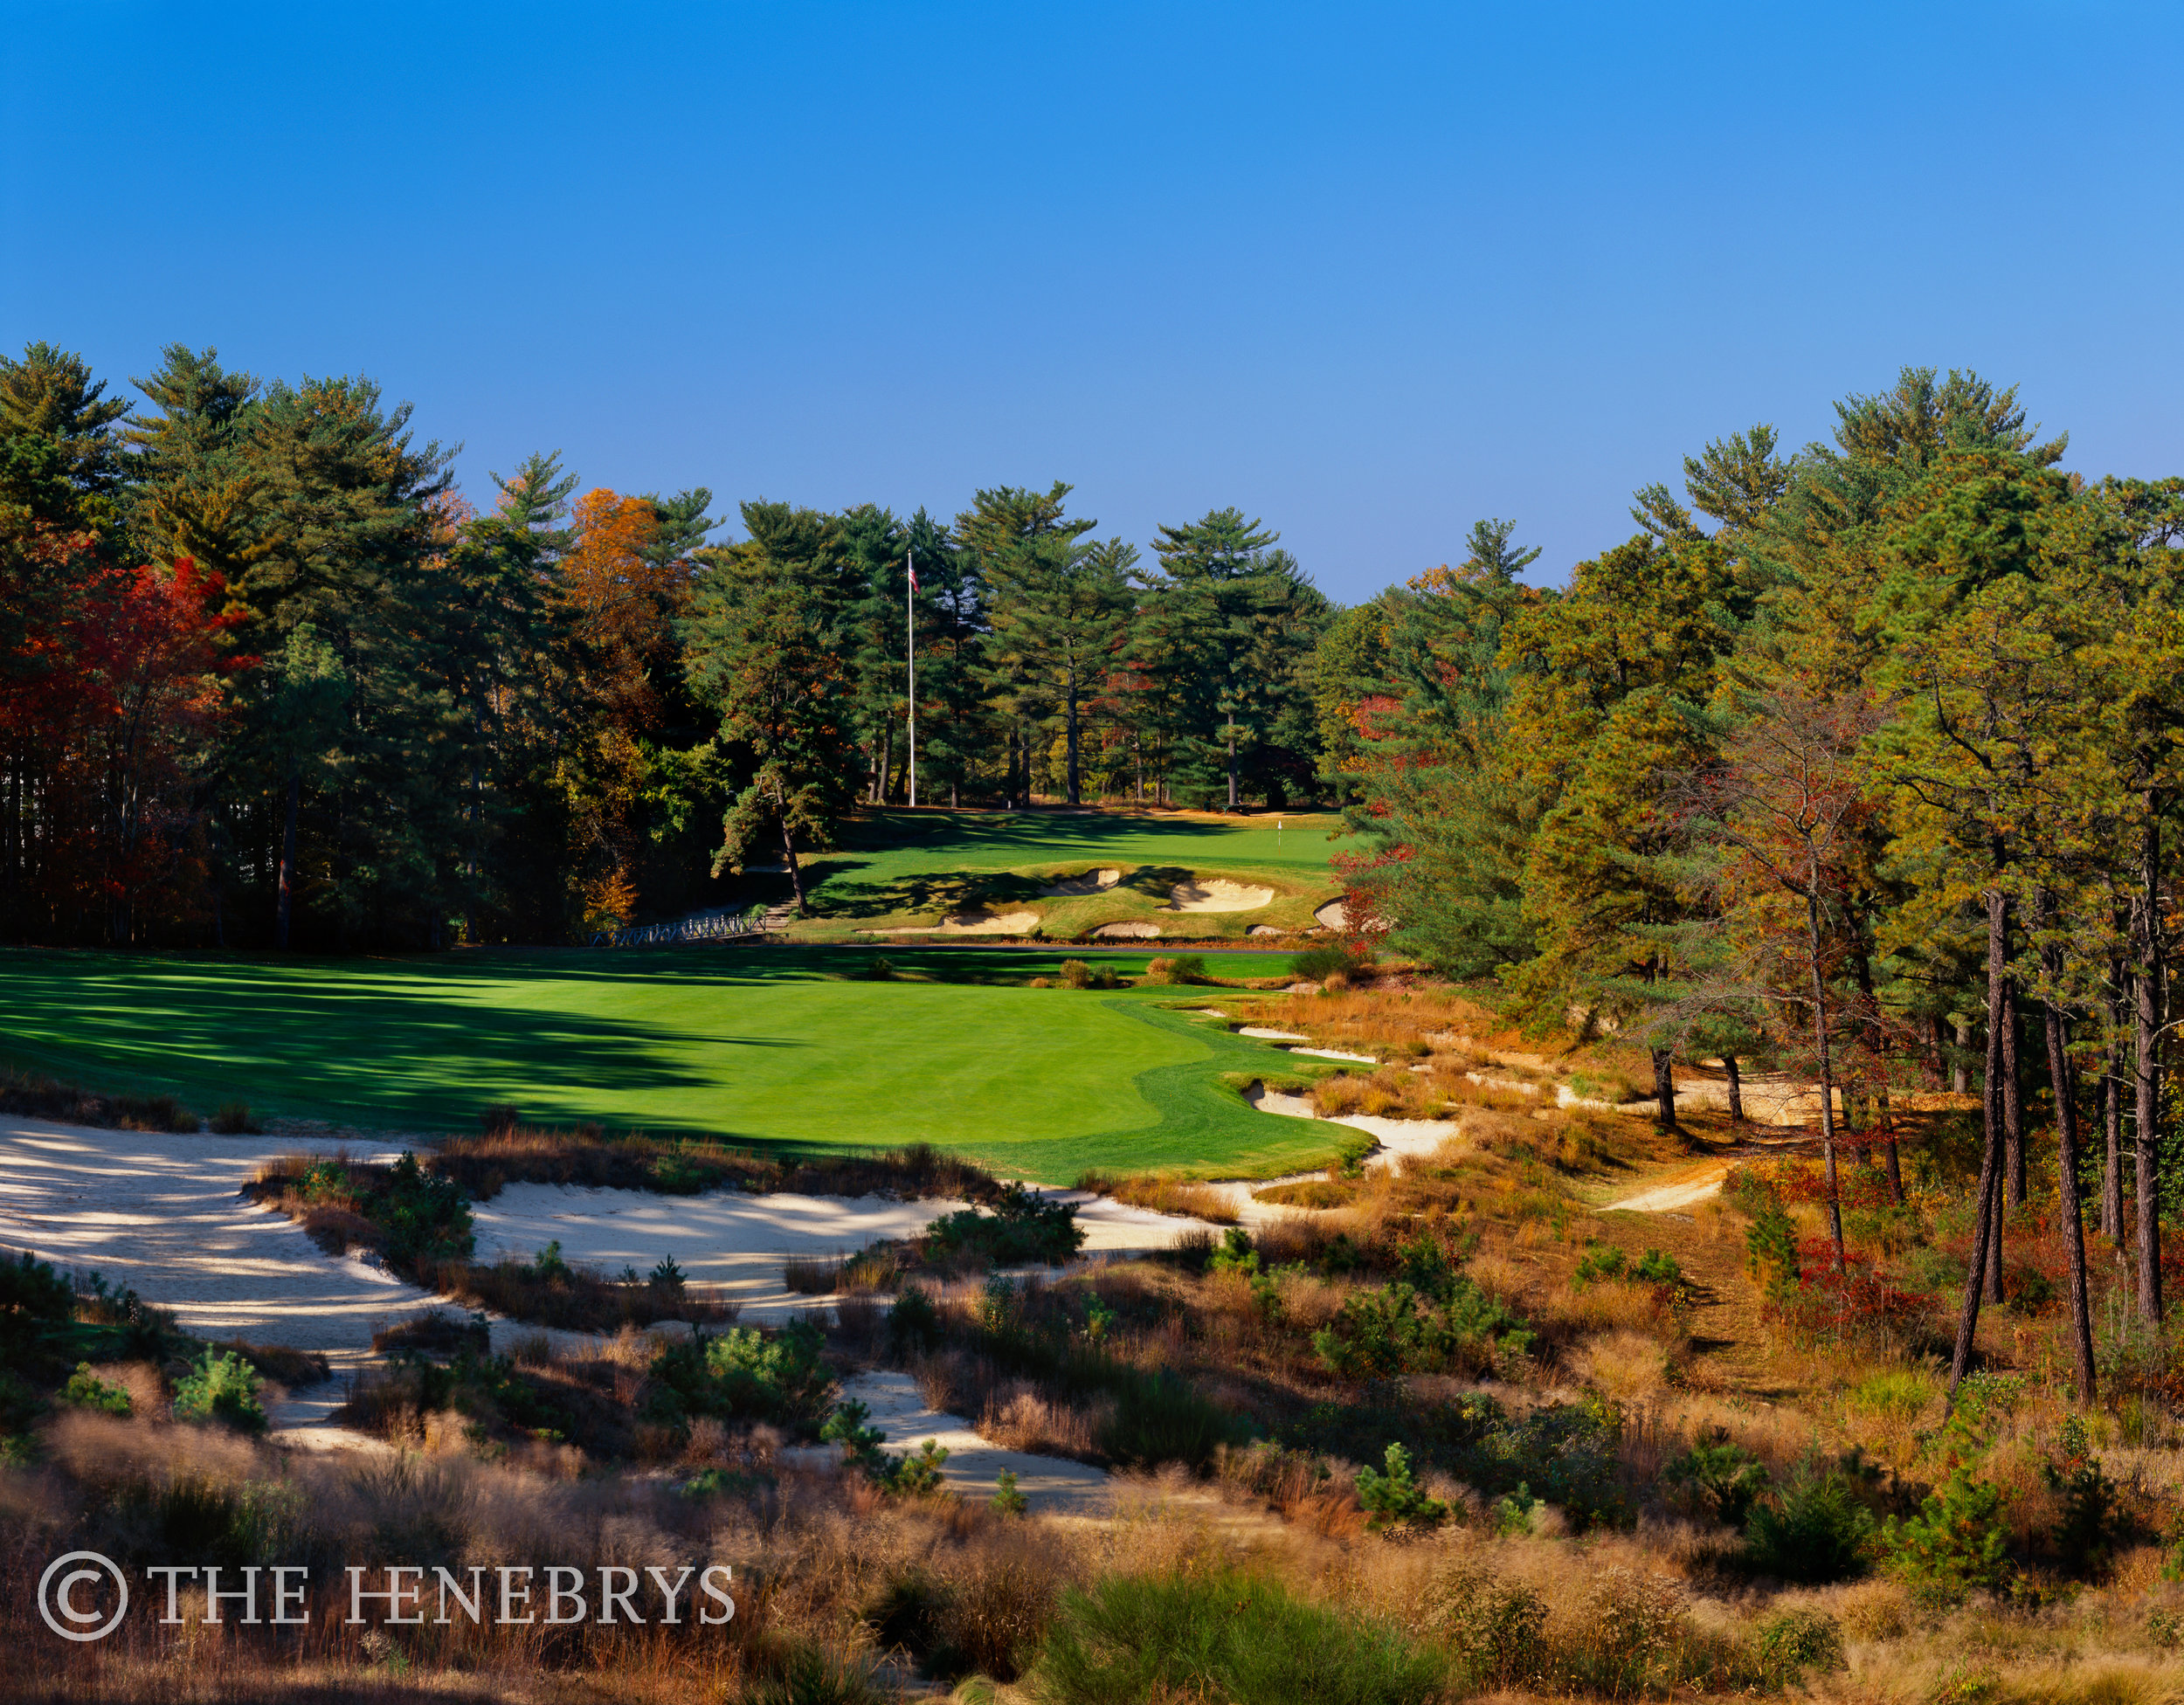 18th Pine Valley Golf Club, Pine Valley, New Jersey